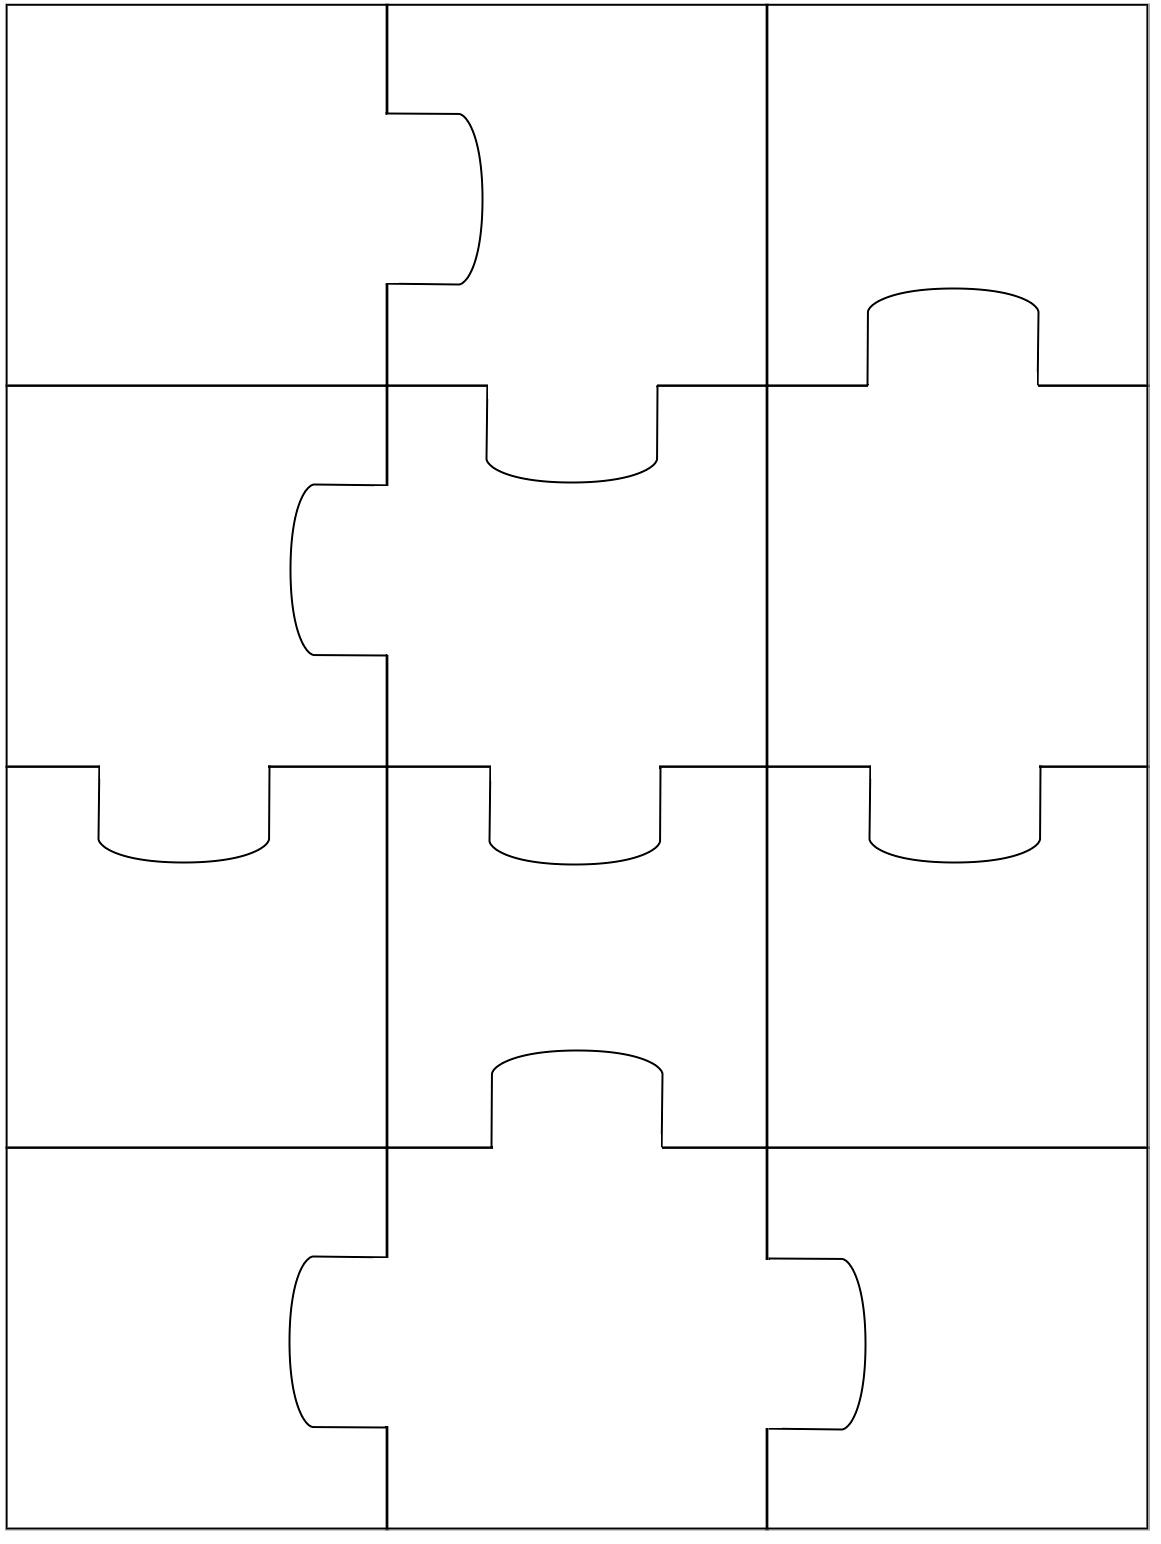 Puzzle Template Beepmunk